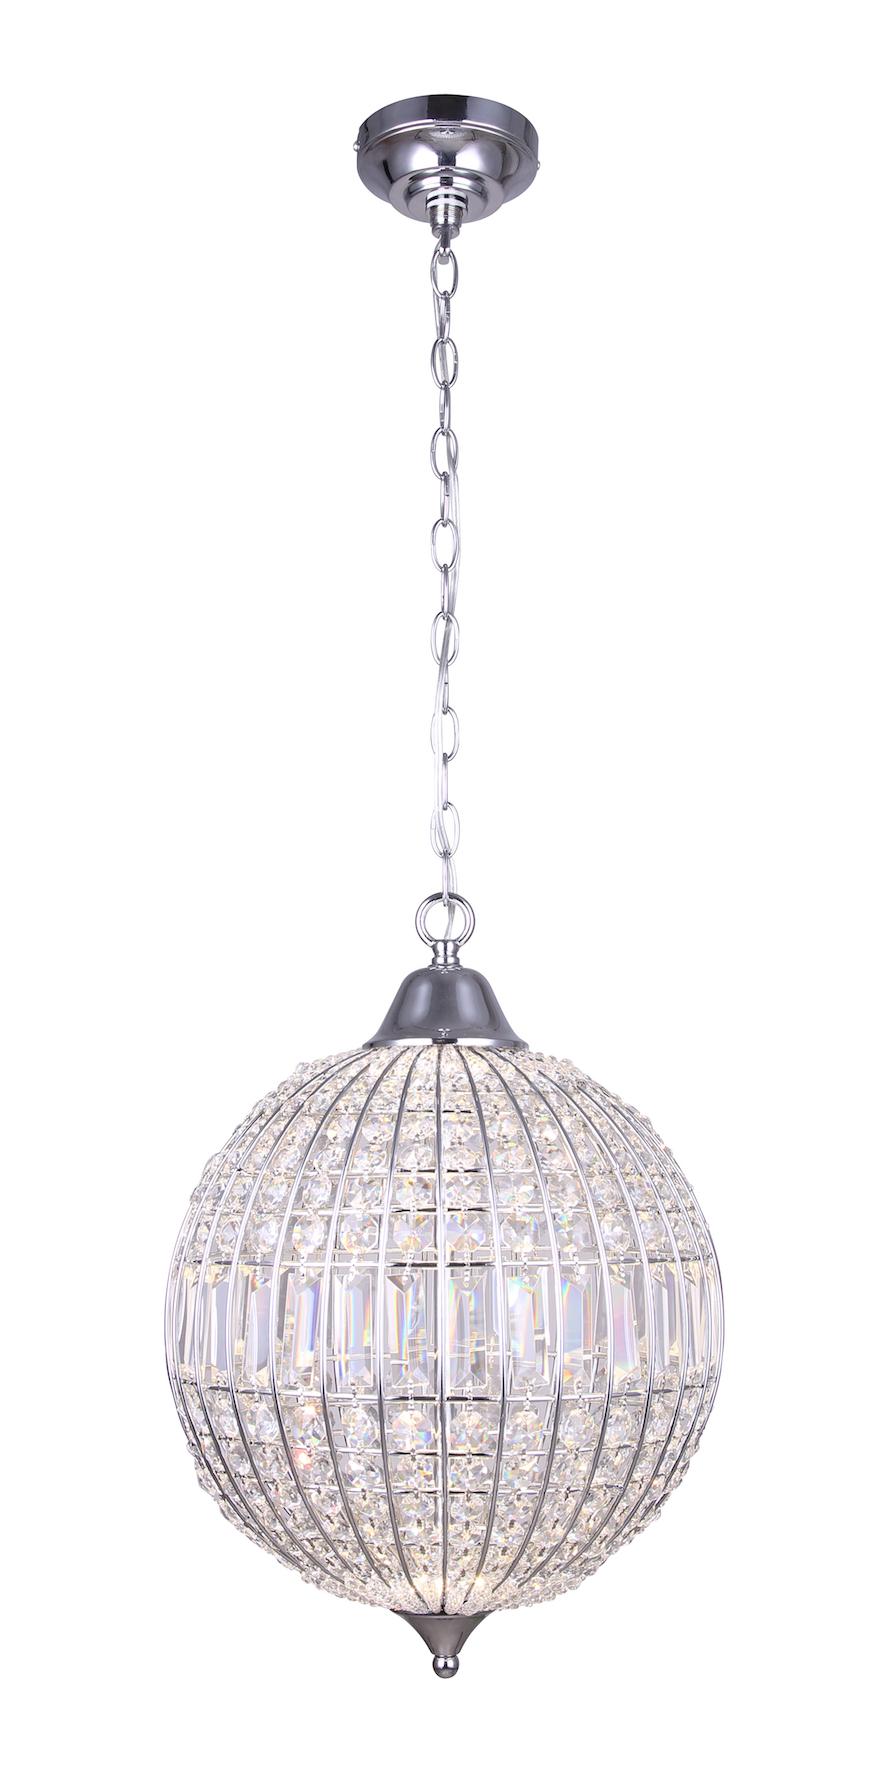 Pendant Lighting  Contemporary TILLY Canarm LPL145A15CH